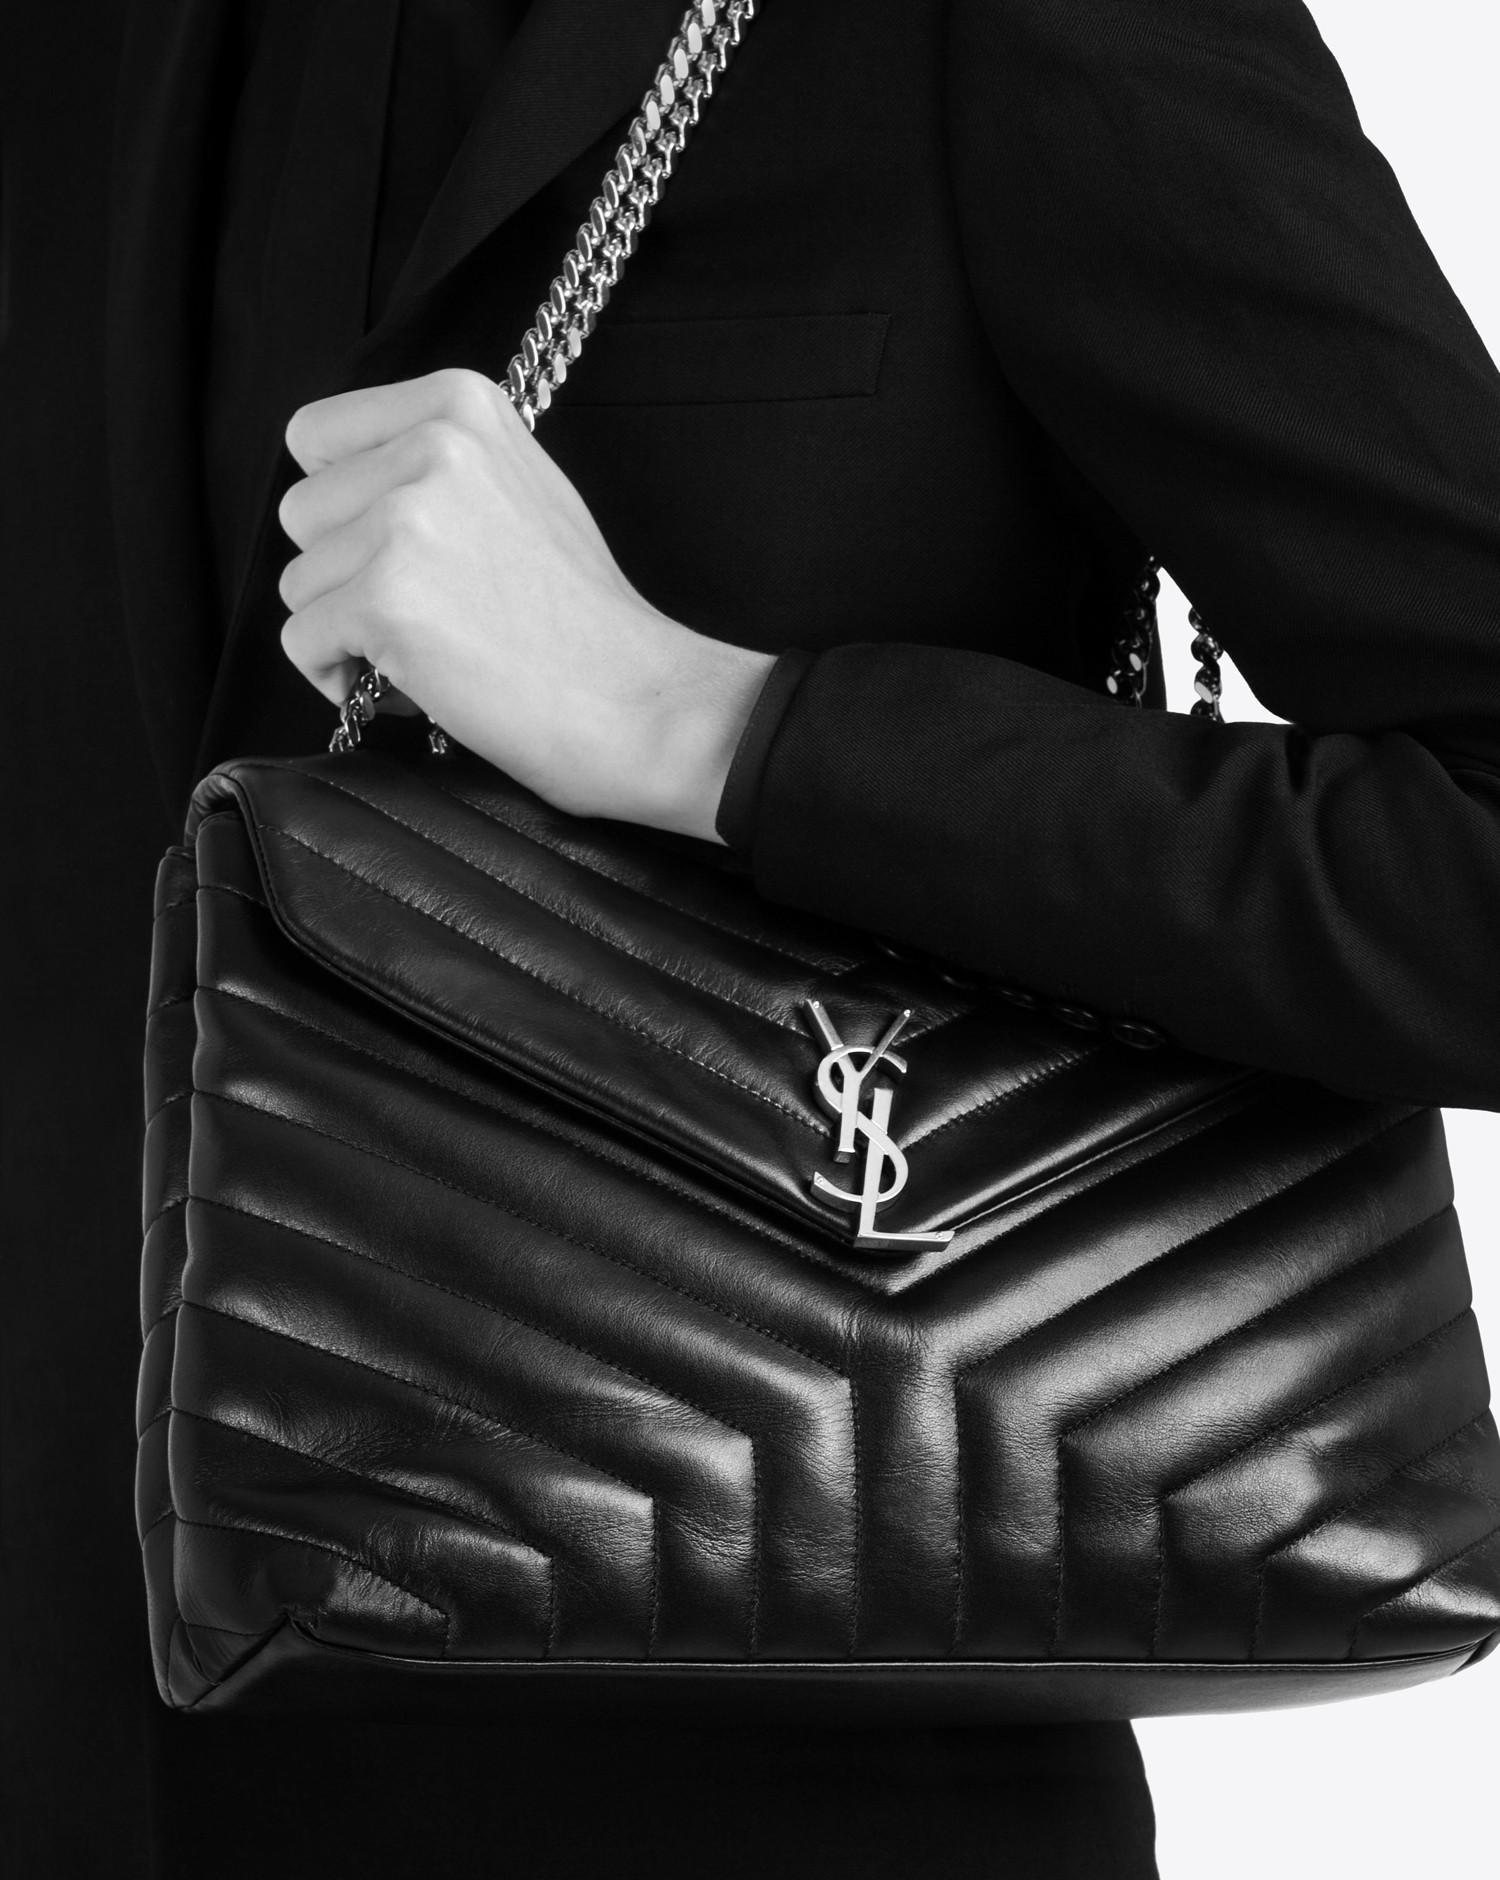 bb47ba65c46ef Lyst - Saint Laurent Medium Loulou Chain Bag In Black